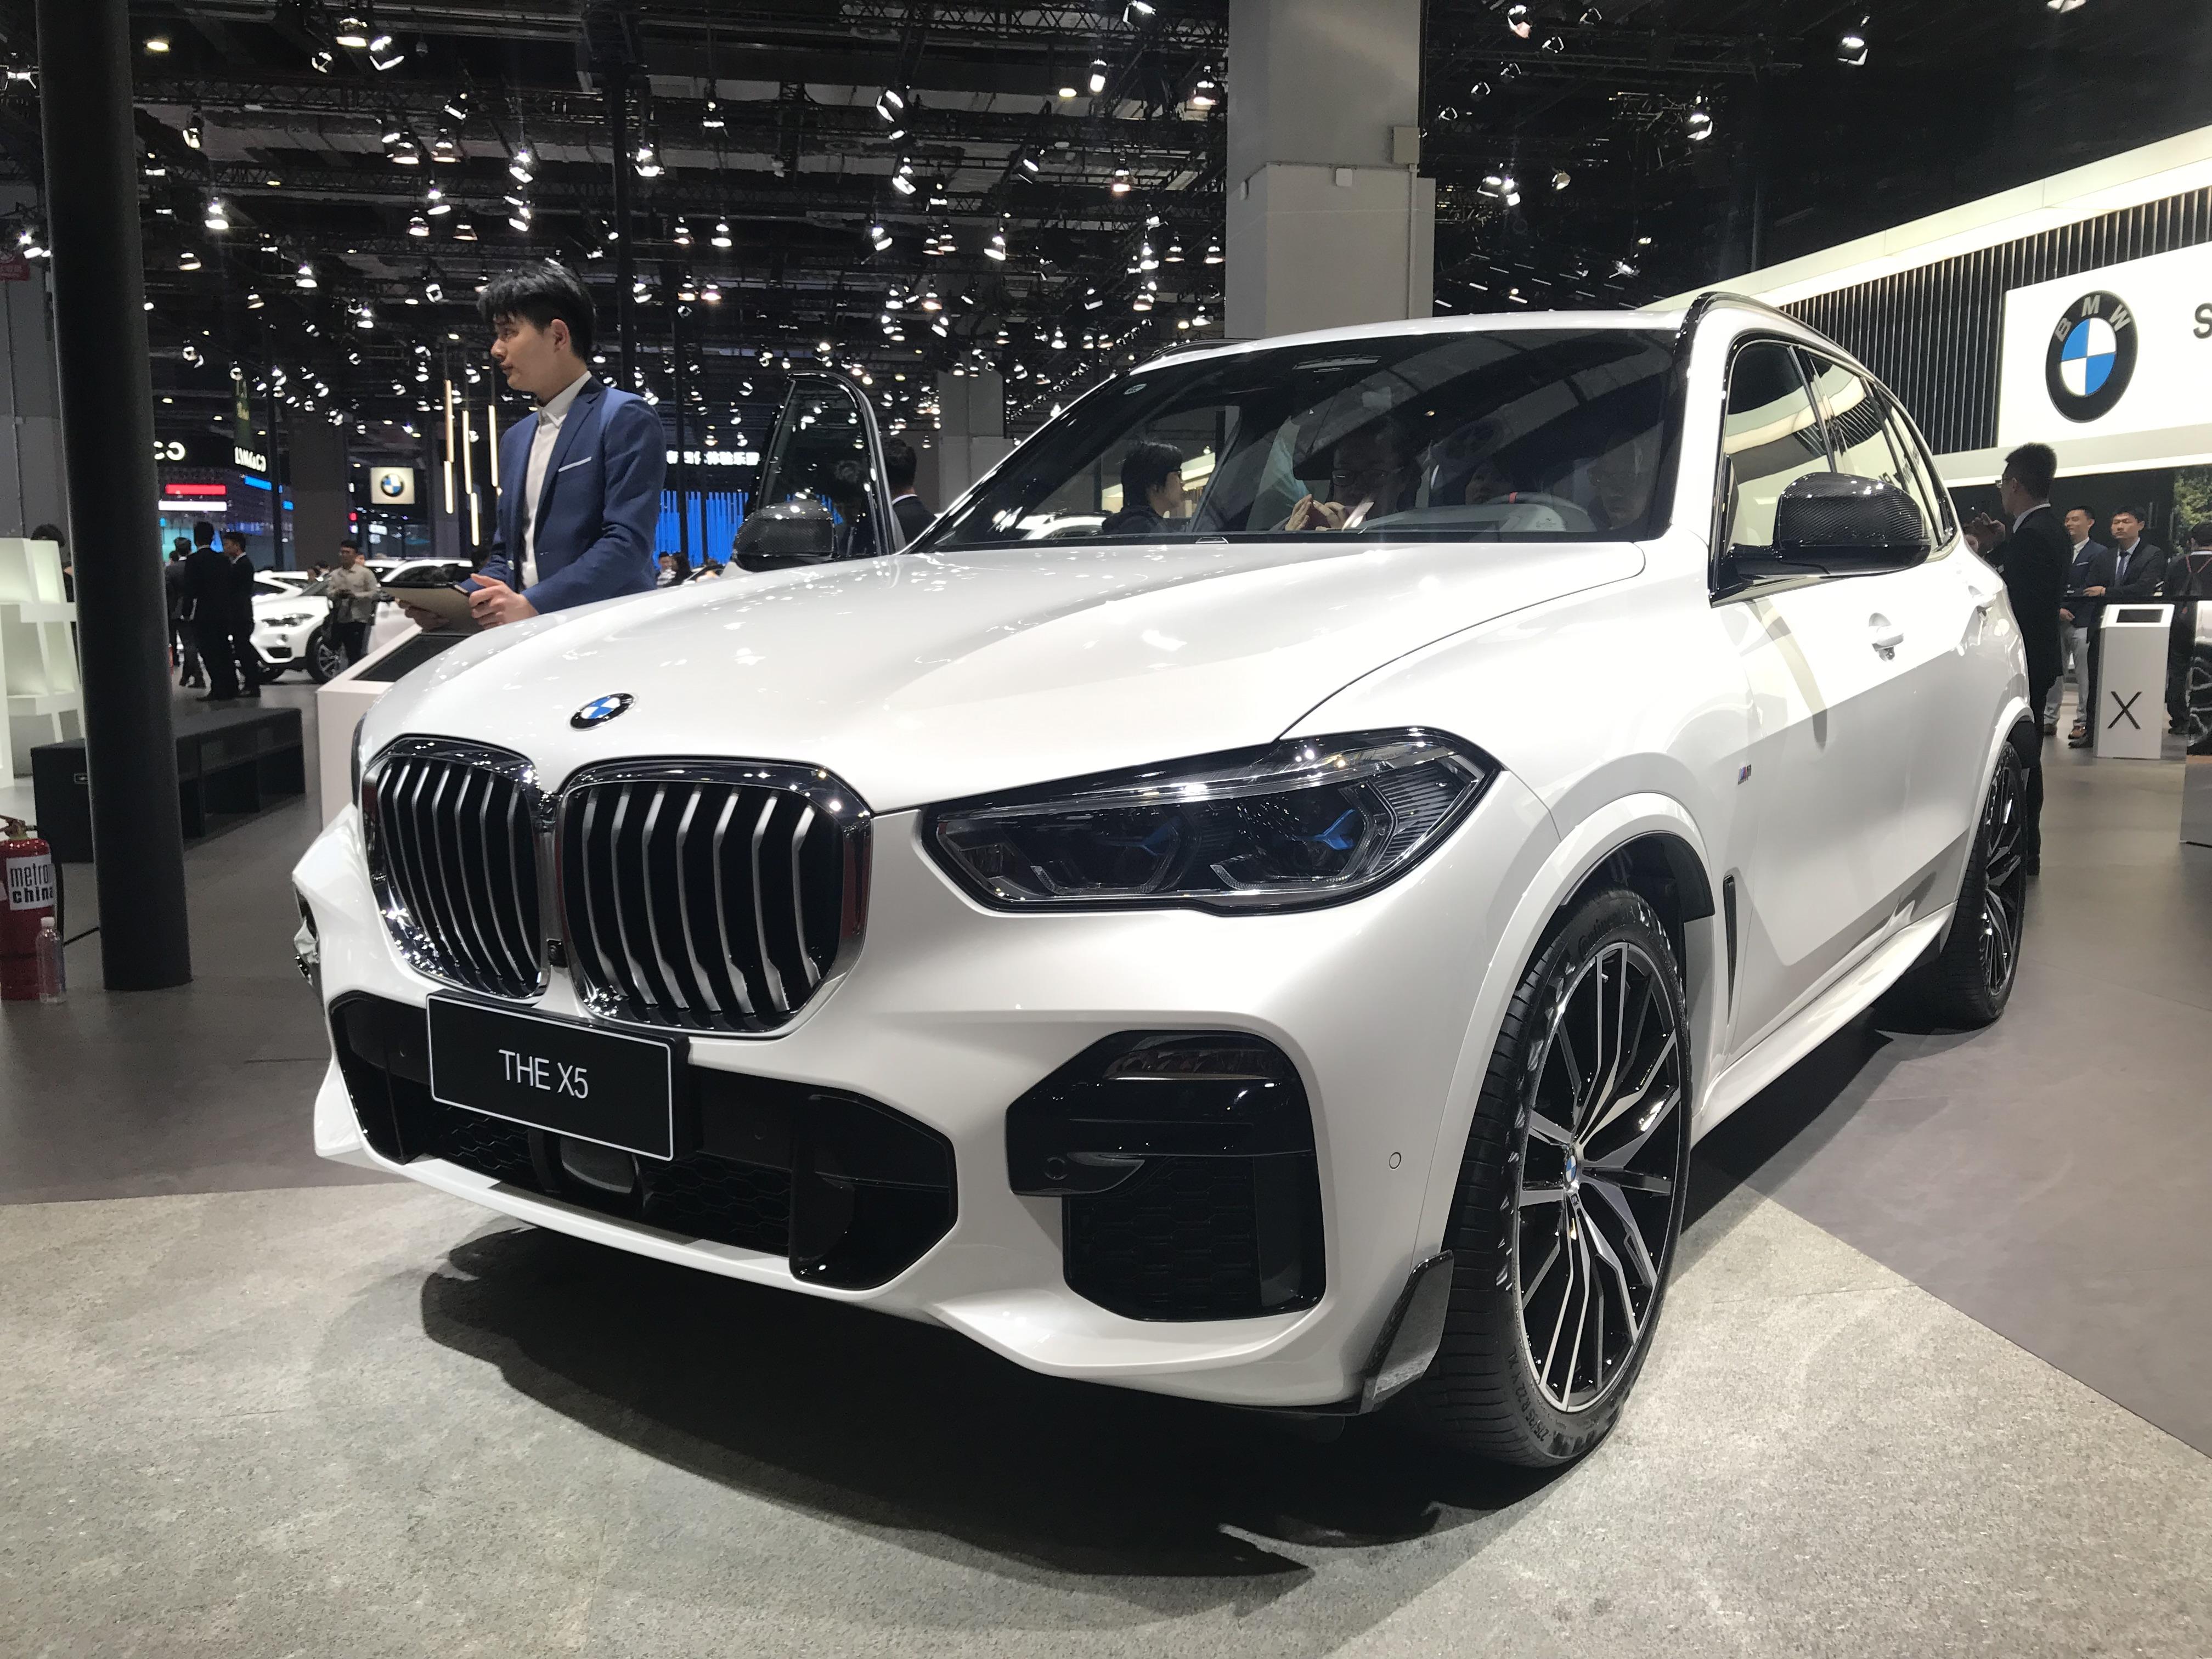 BMW X5 G05 001.jpg